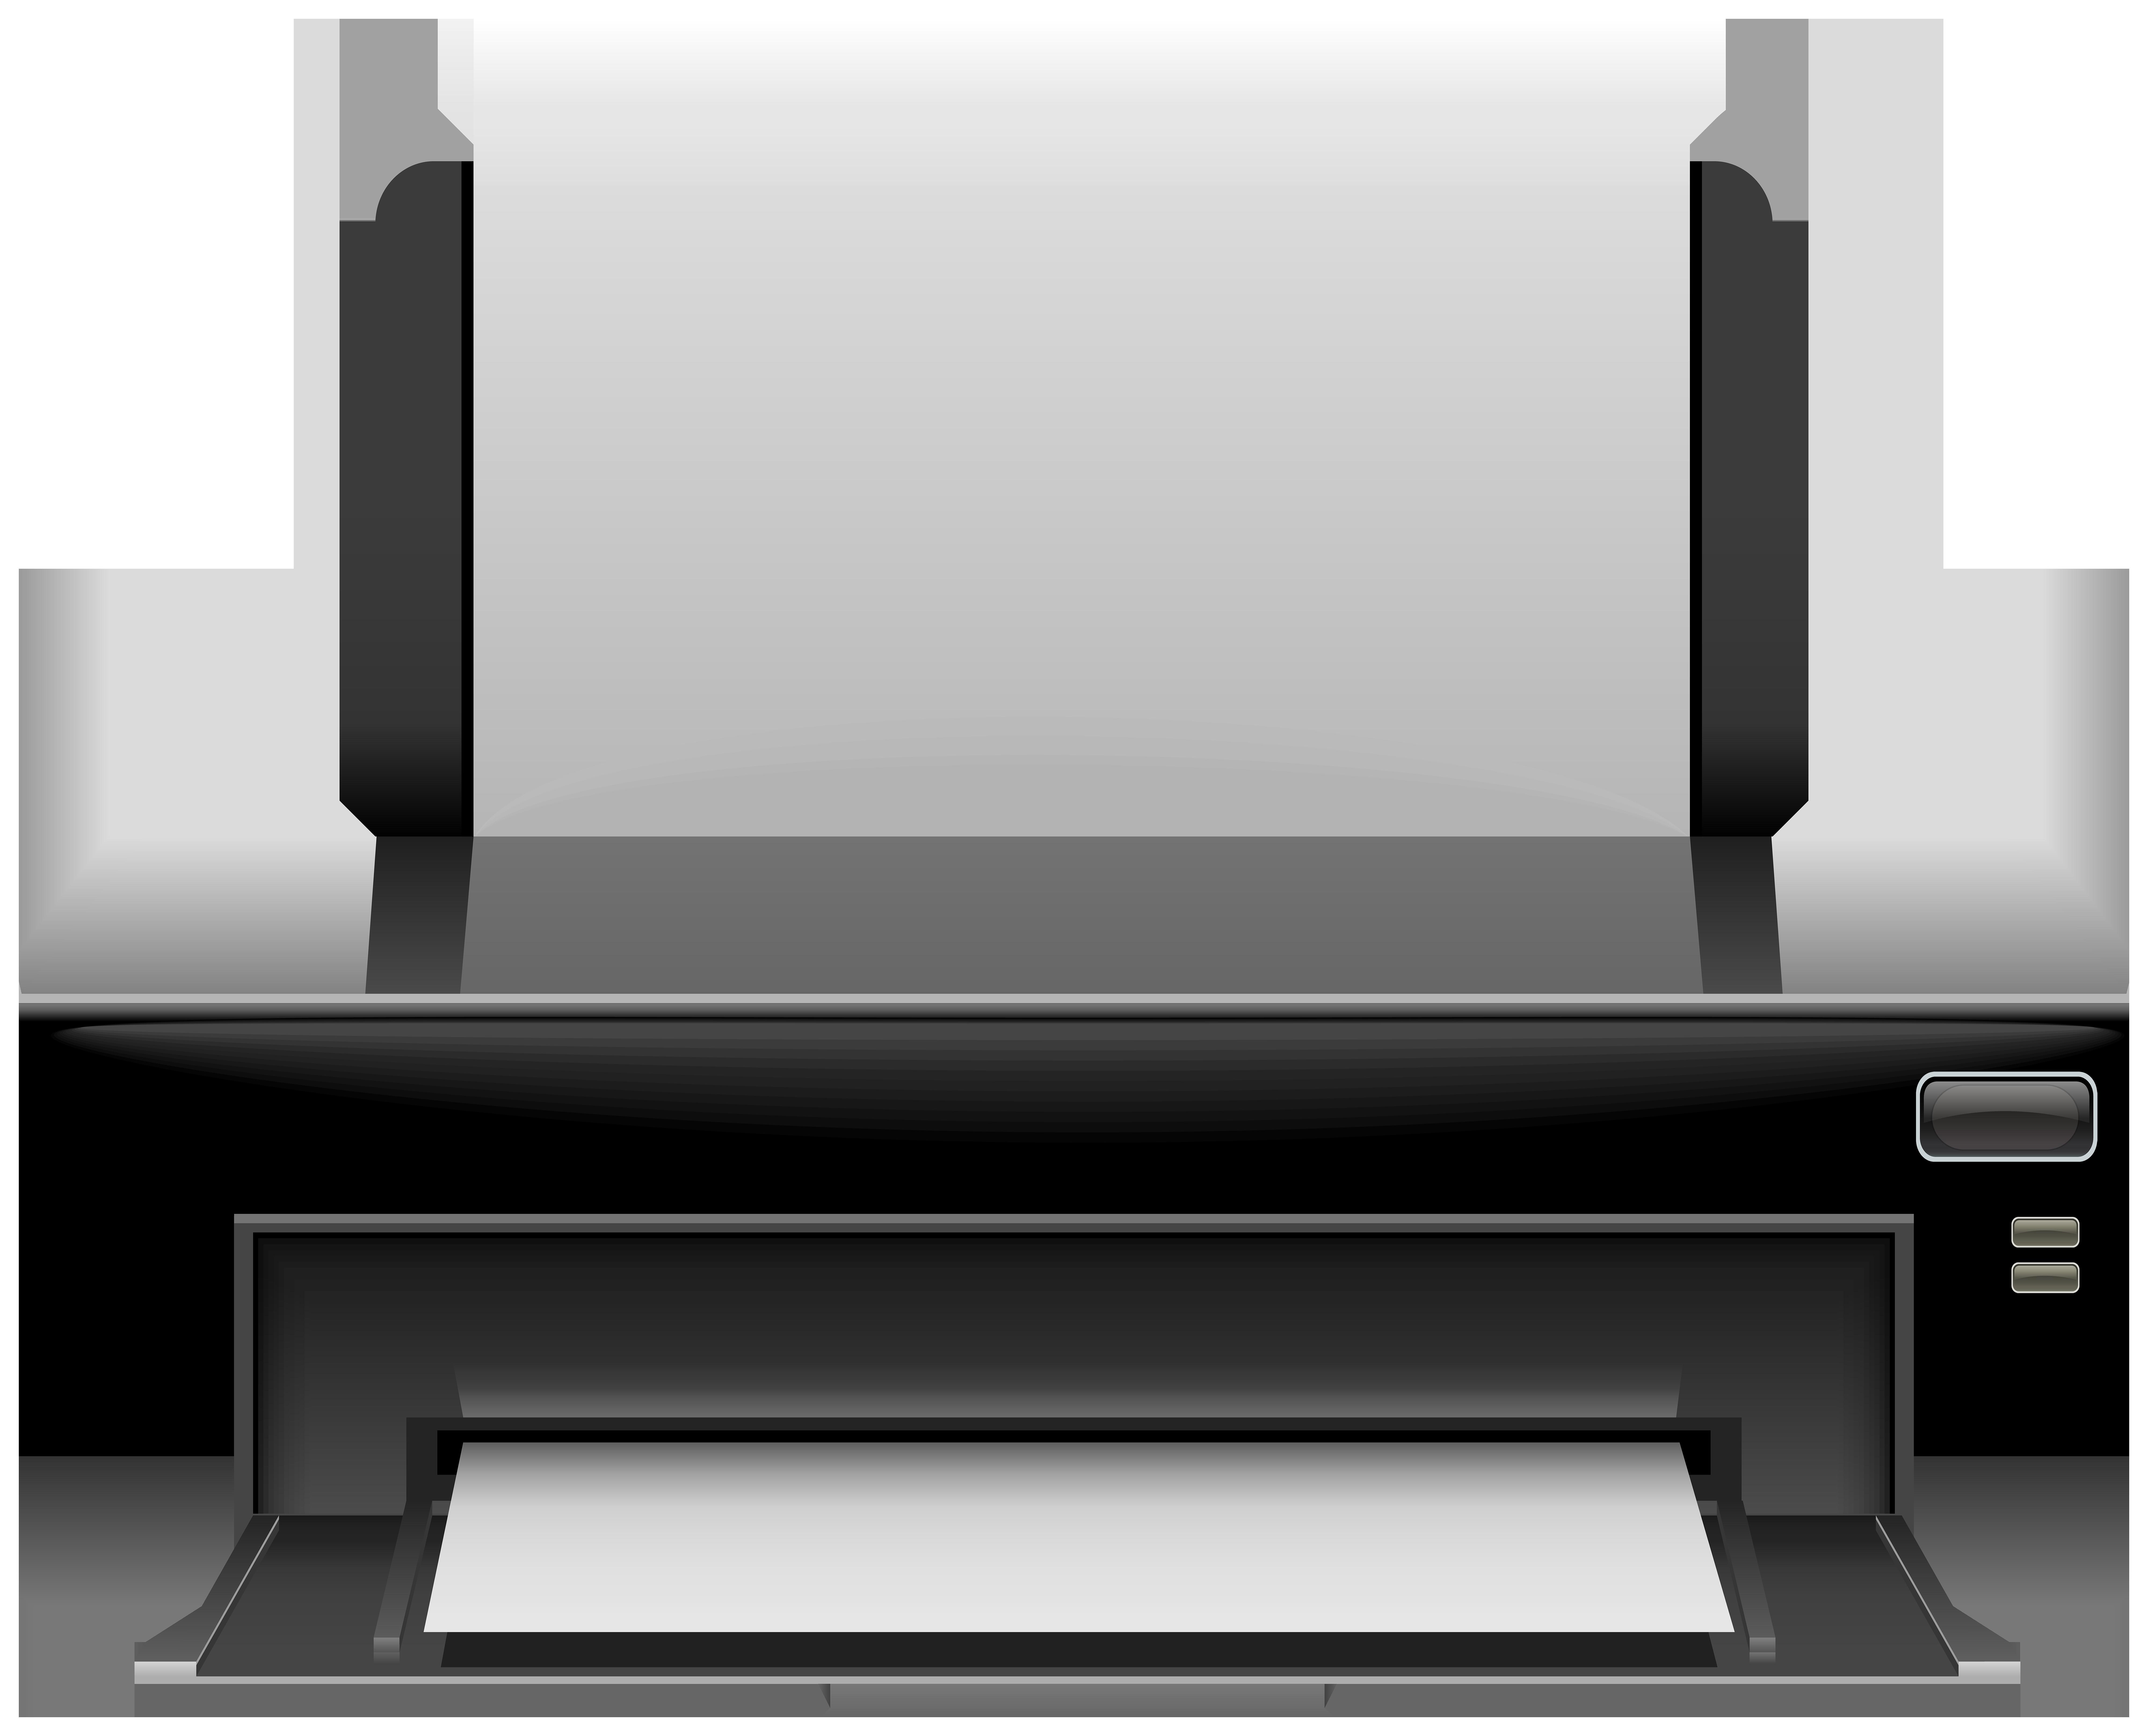 svg stock Black png clip art. Printer clipart.